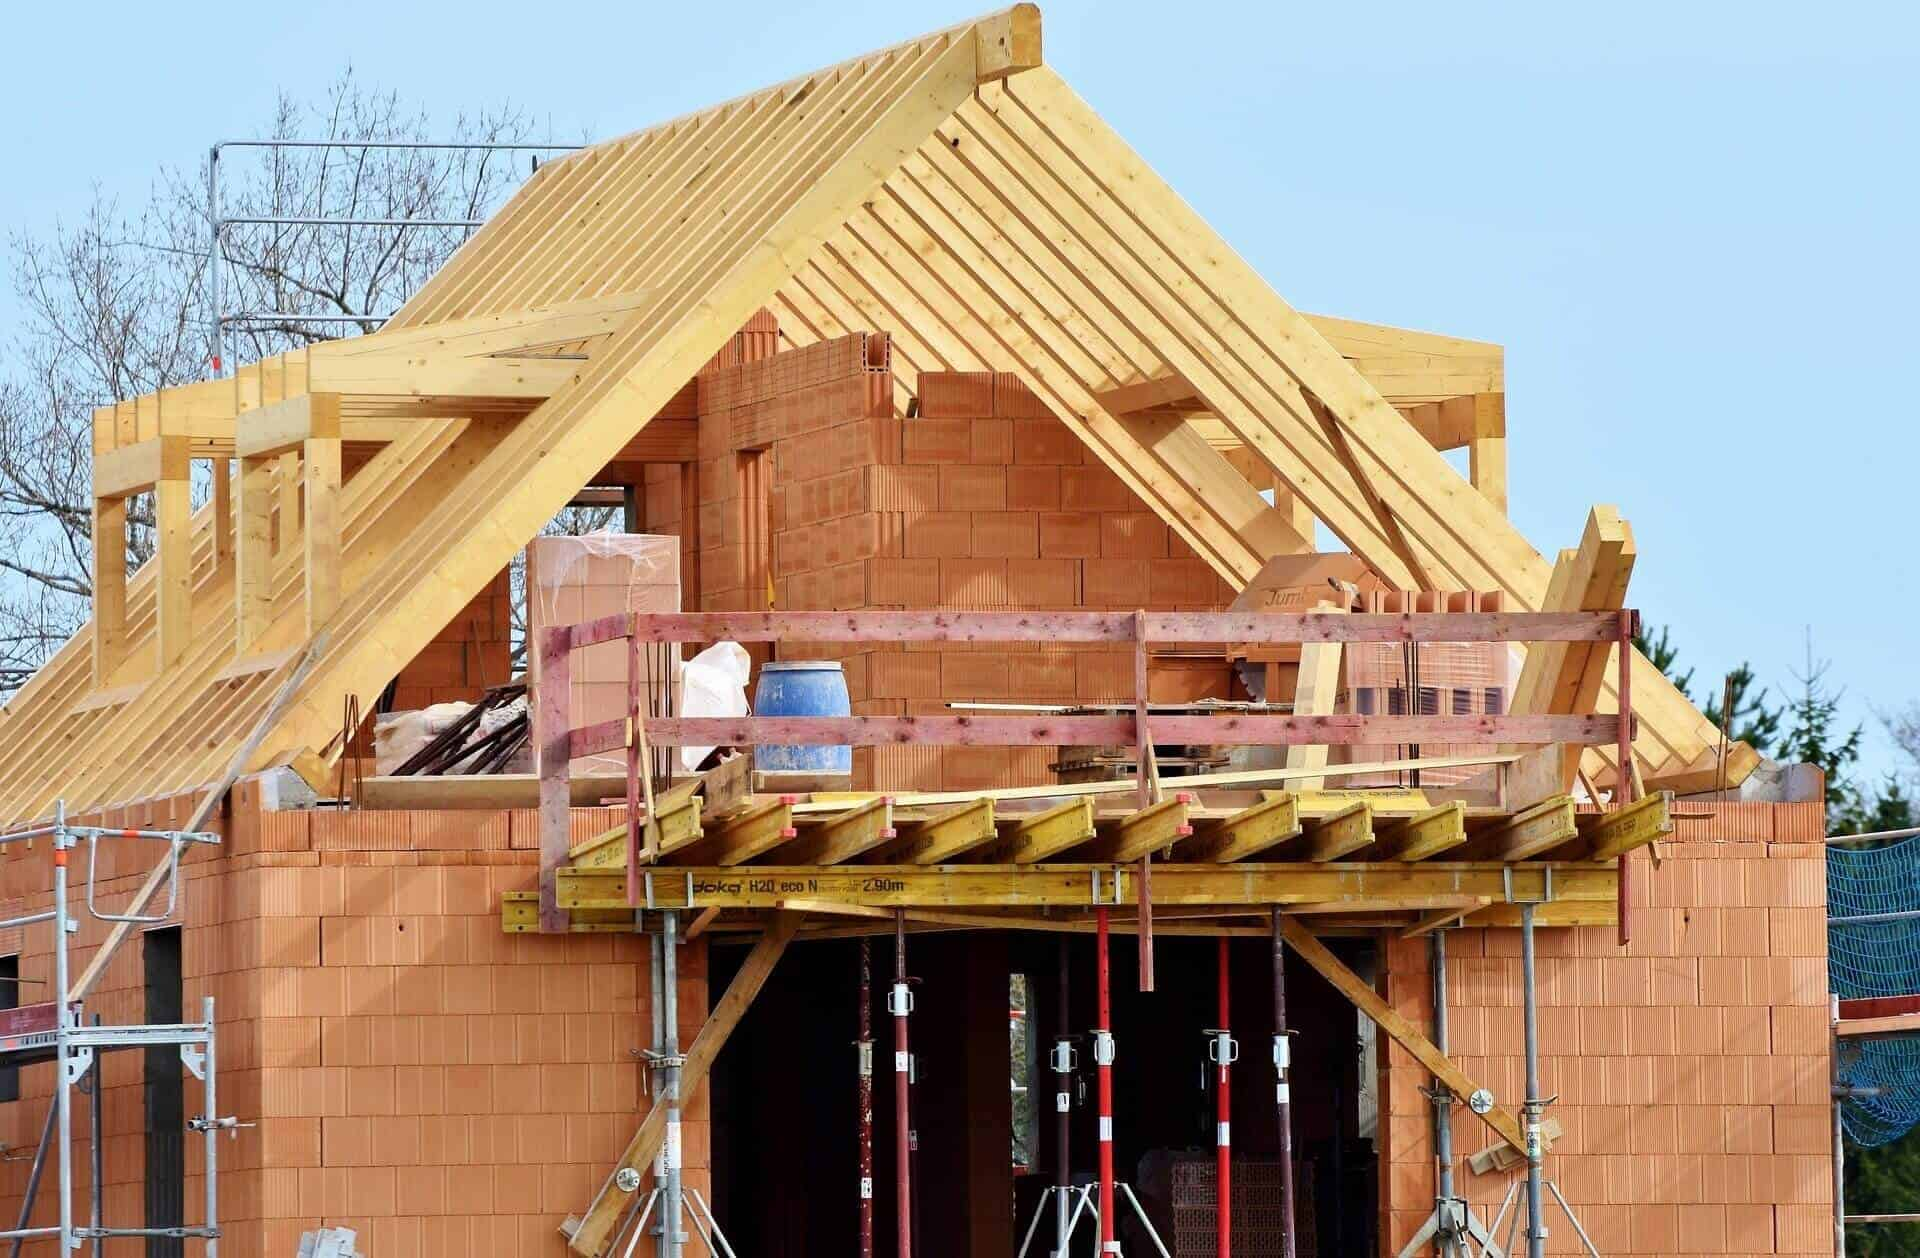 Immobilienfinanzierung Hausbau